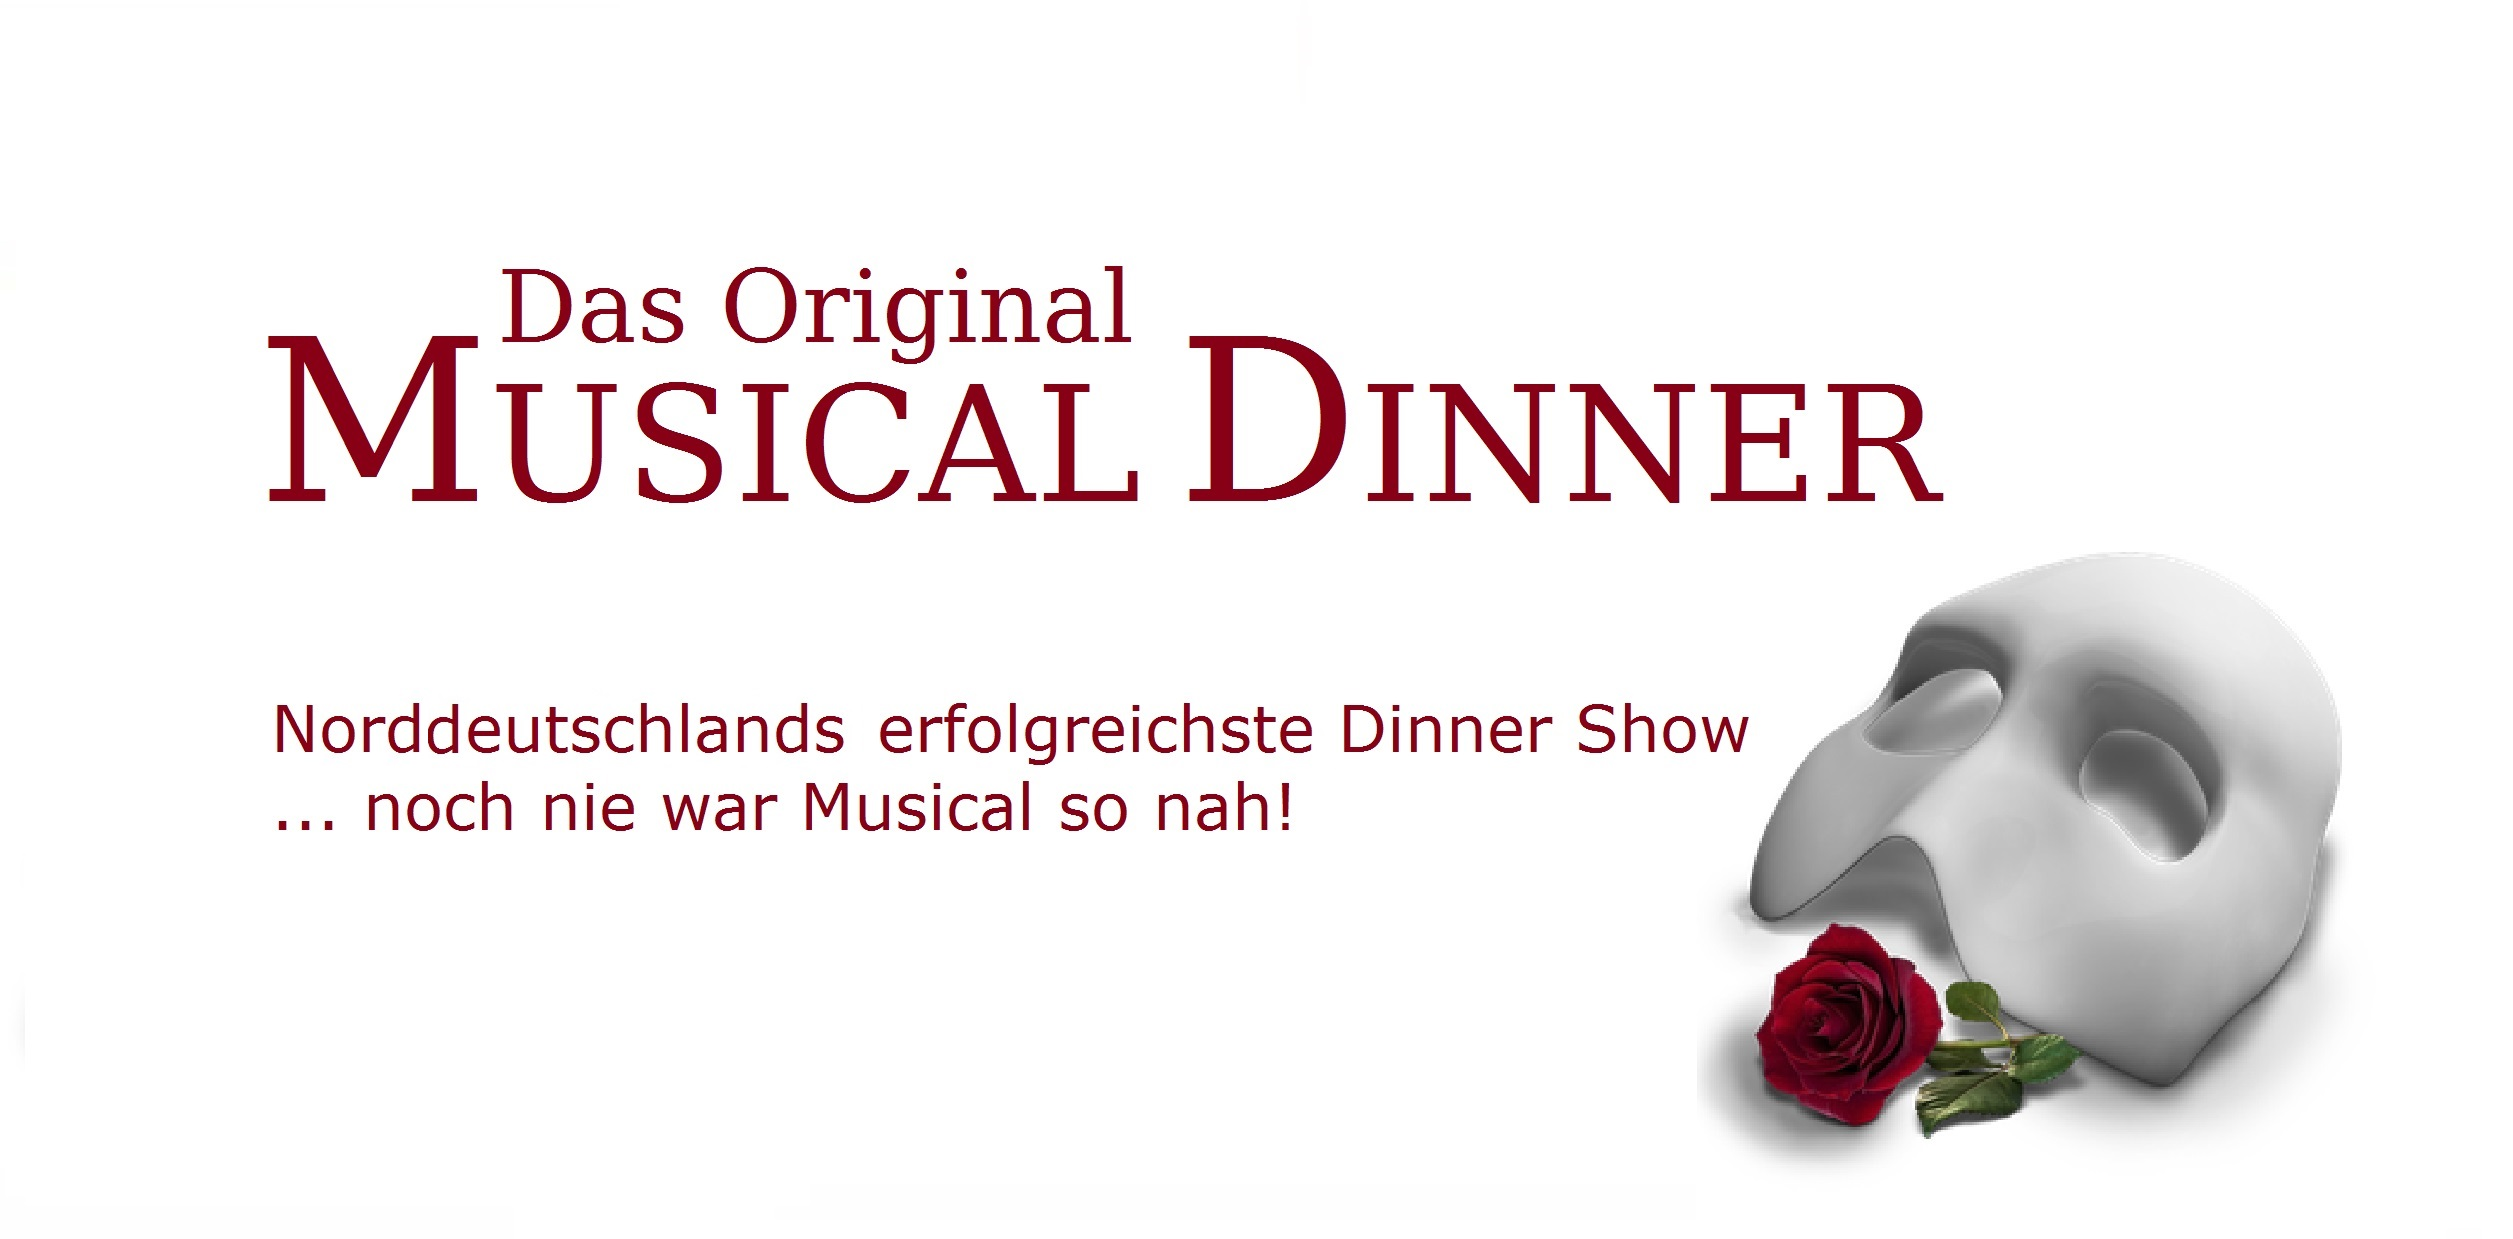 musical-dinner-das-original_1